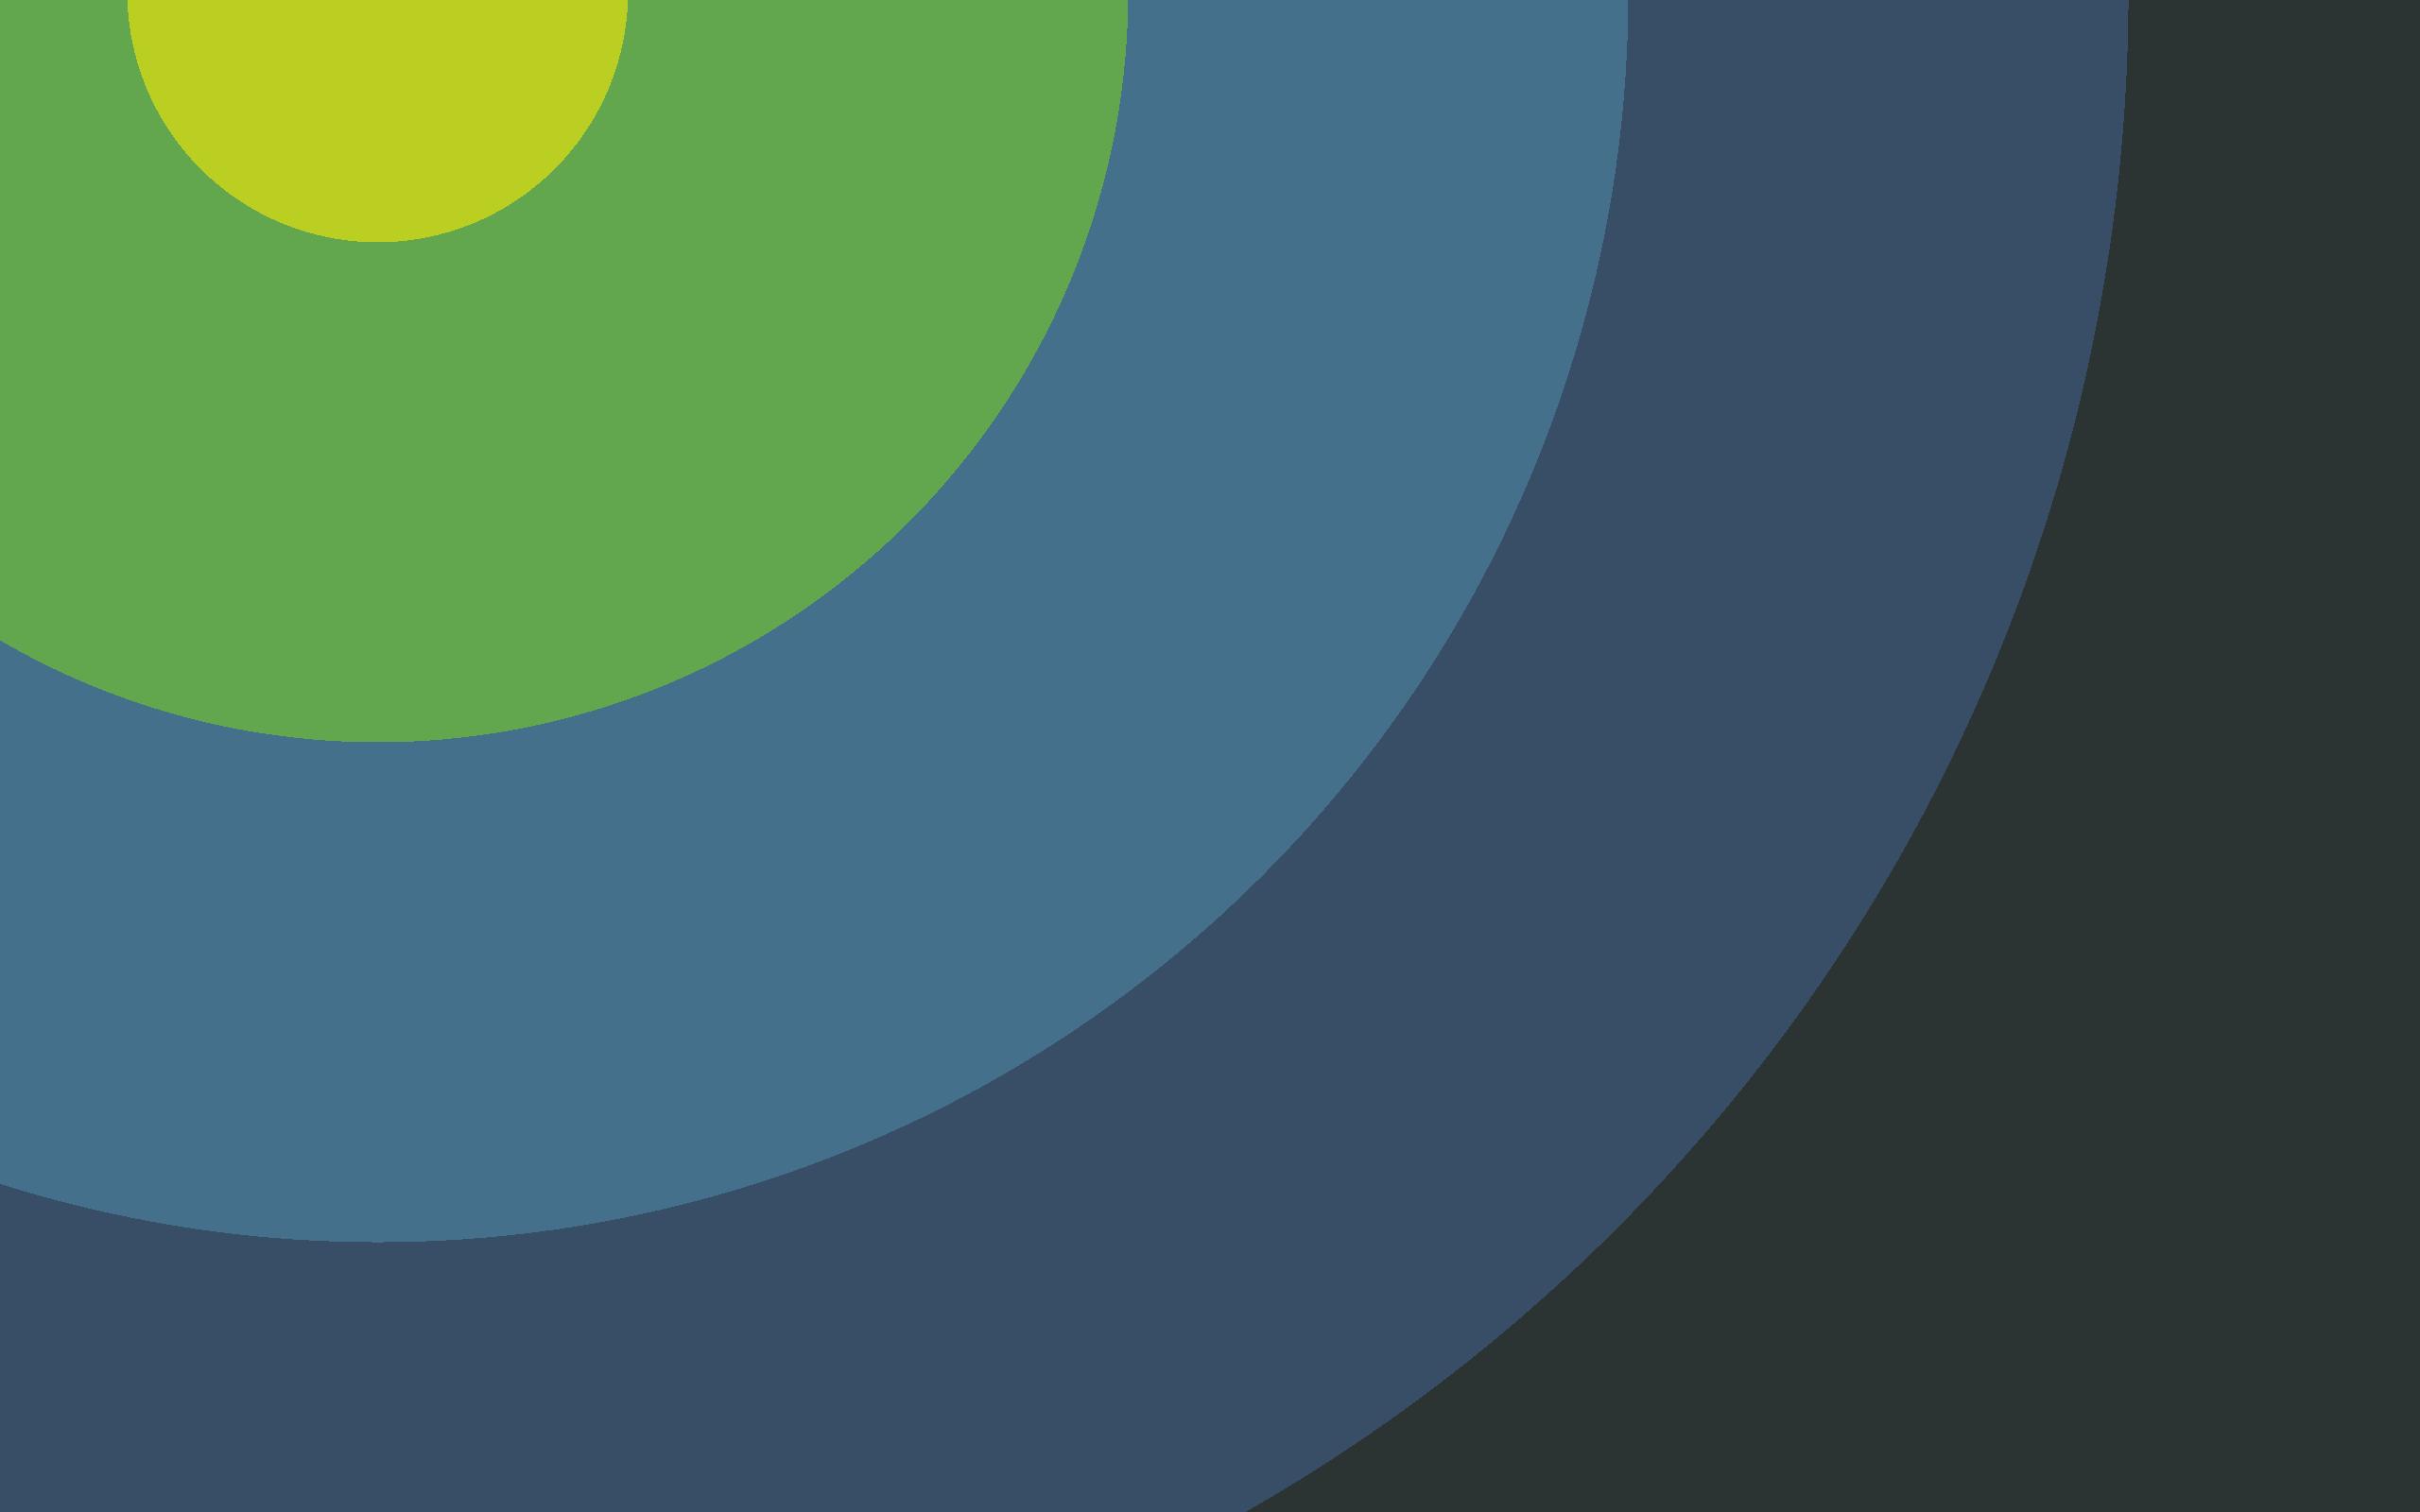 android wallpaper flat minimal